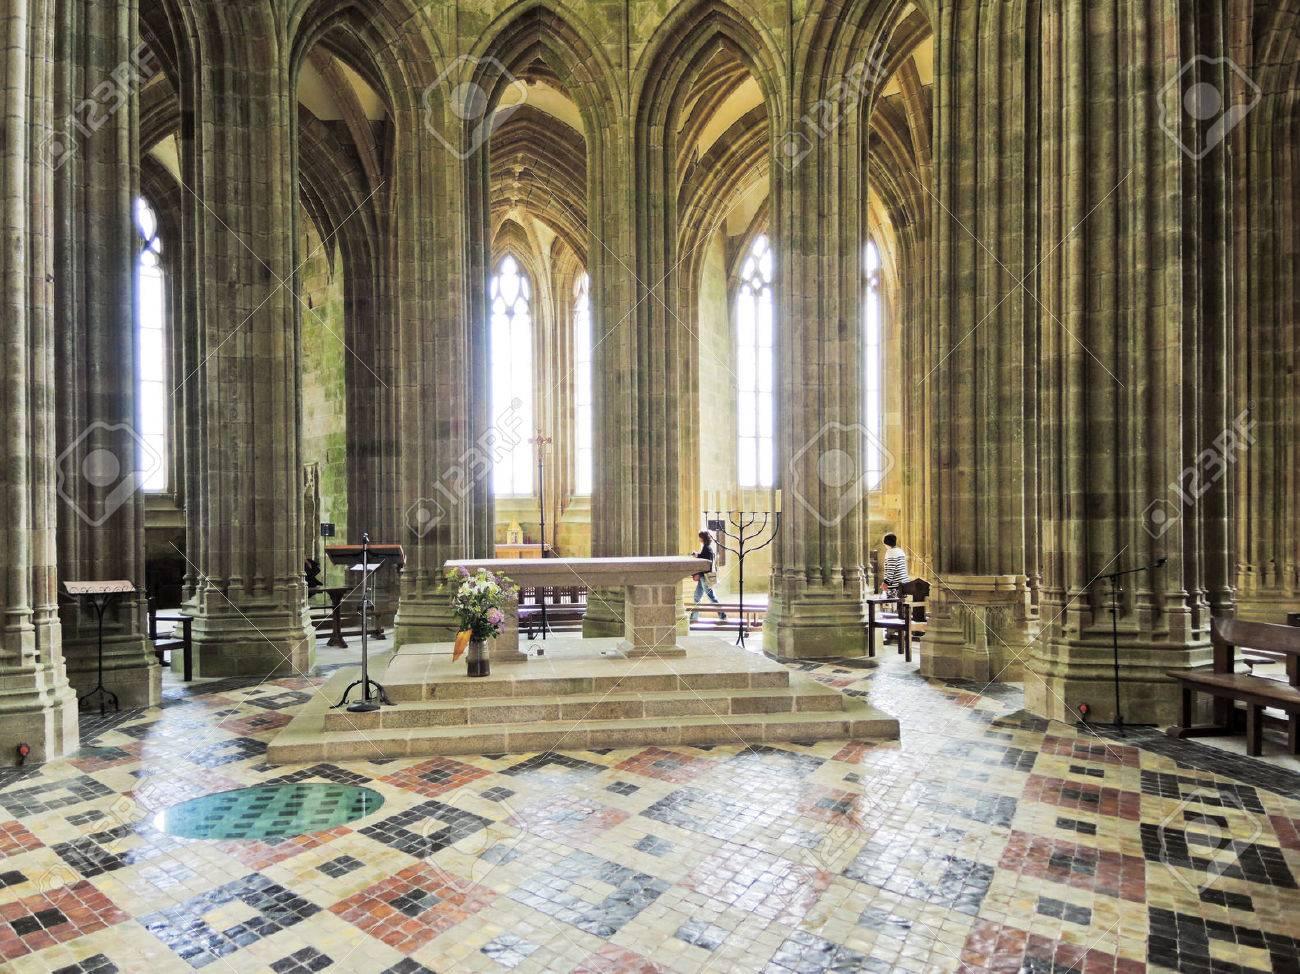 Mont Saint Michel France August 9 2014 Interior Of Church Abbey